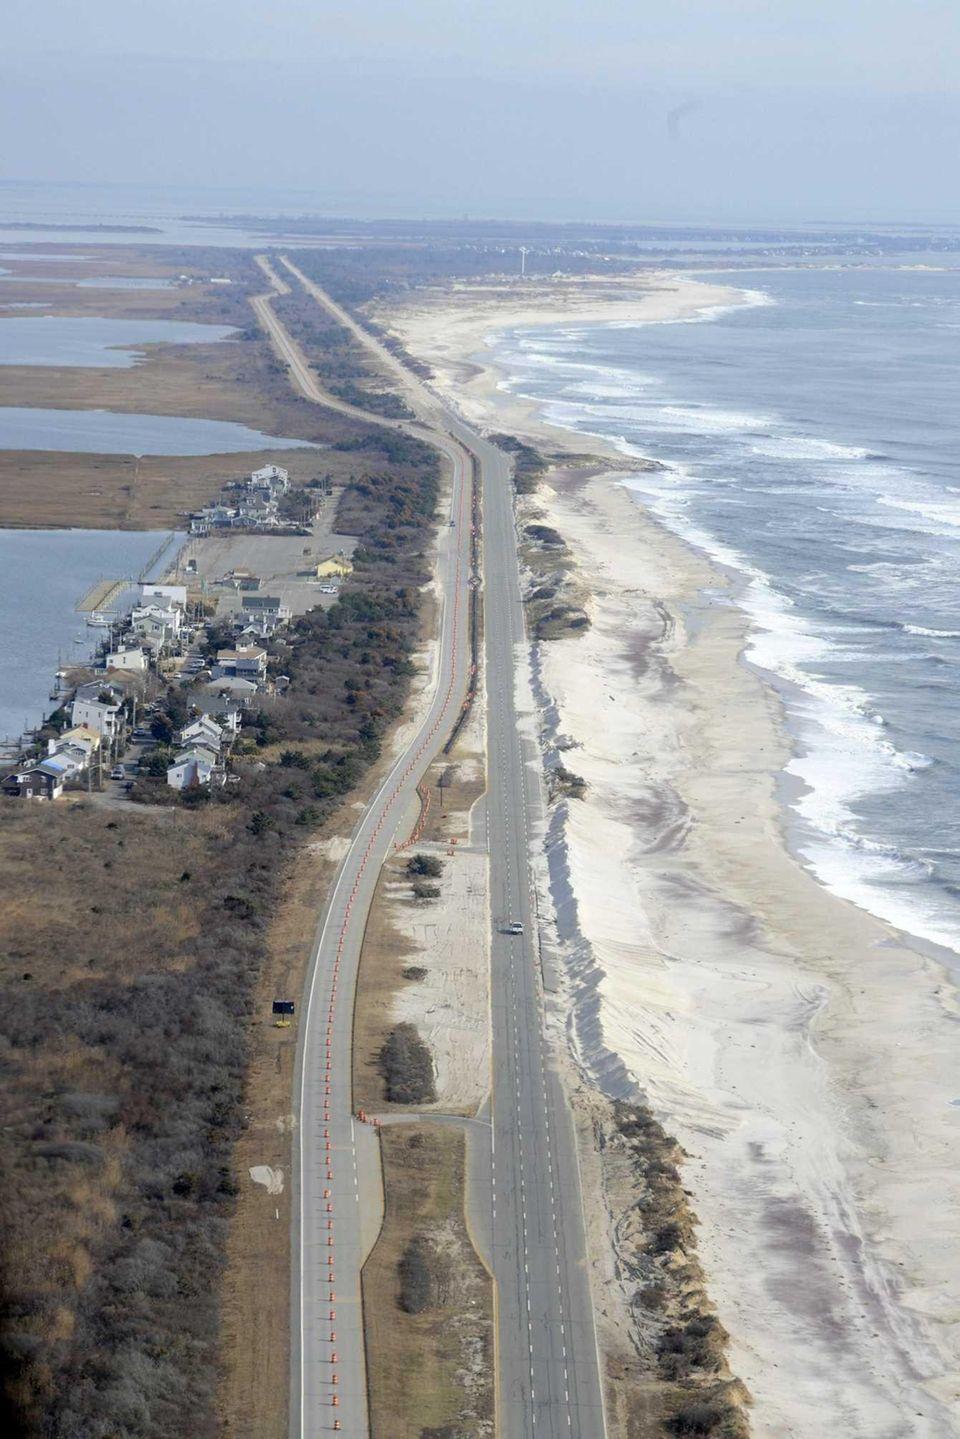 Master builder Robert Moses wanted Ocean Parkway to